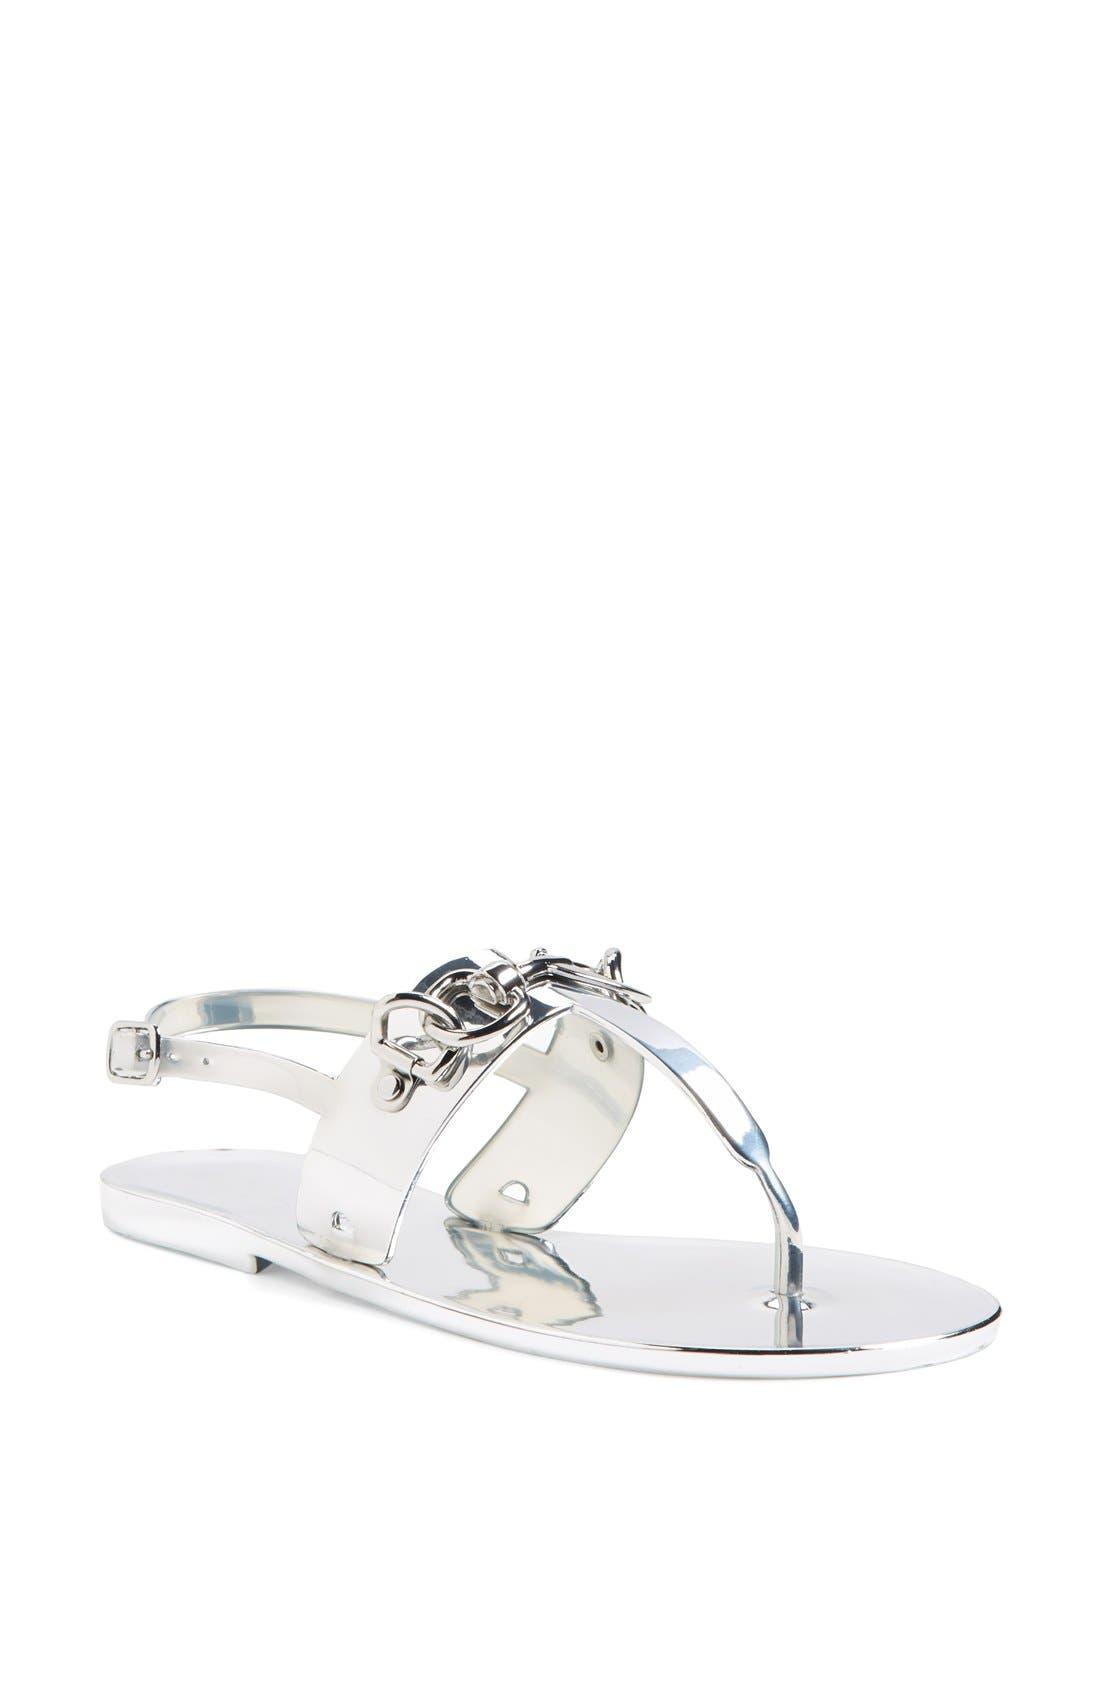 Alternate Image 1 Selected - Rebecca Minkoff 'Petra' Sandal